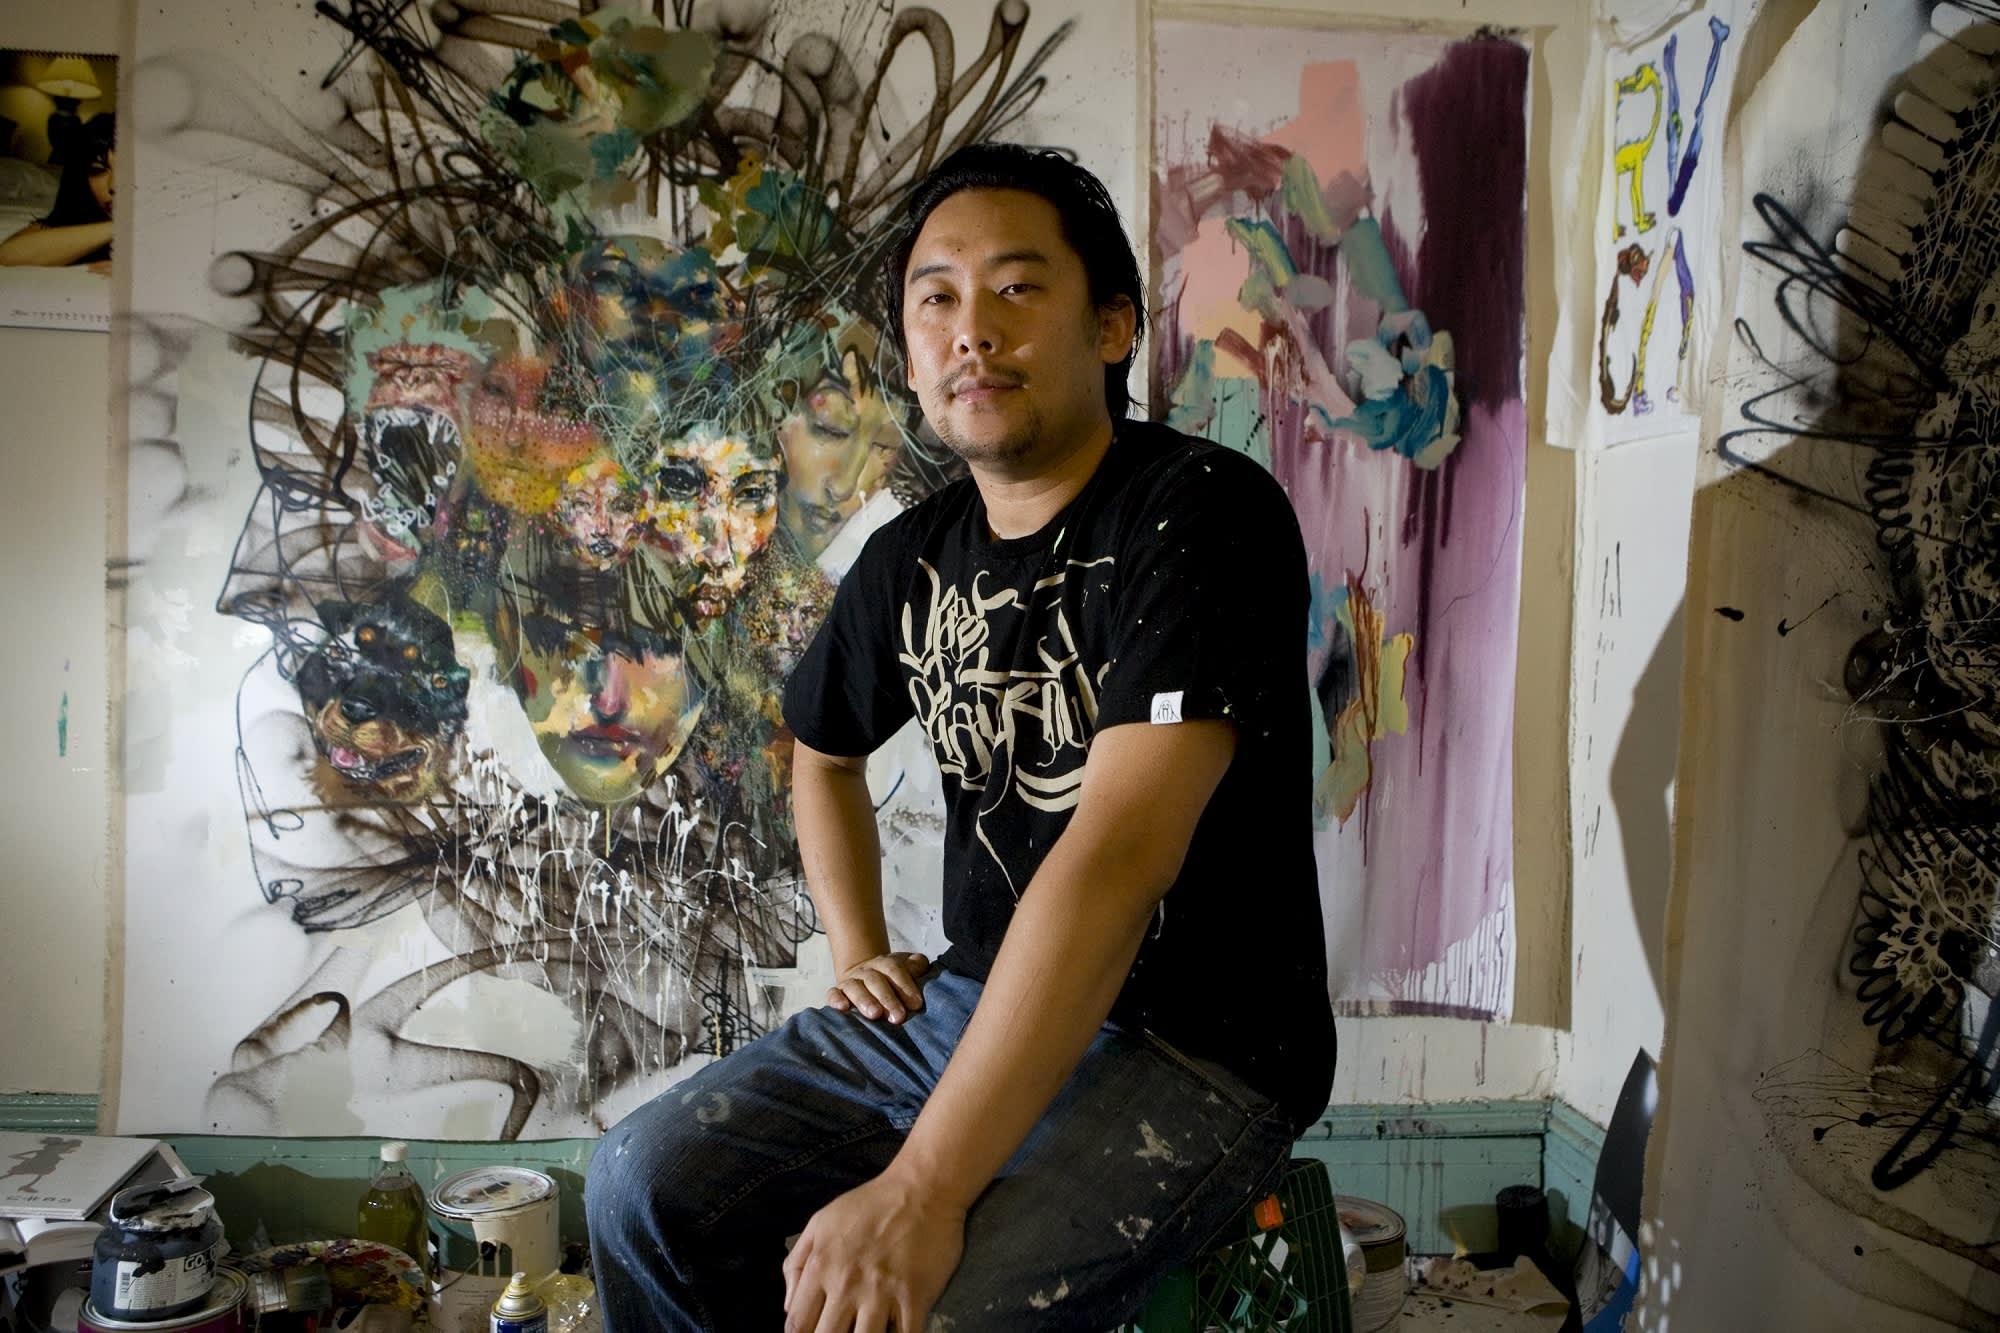 How Facebook graffiti artist David Choe earned $200 million